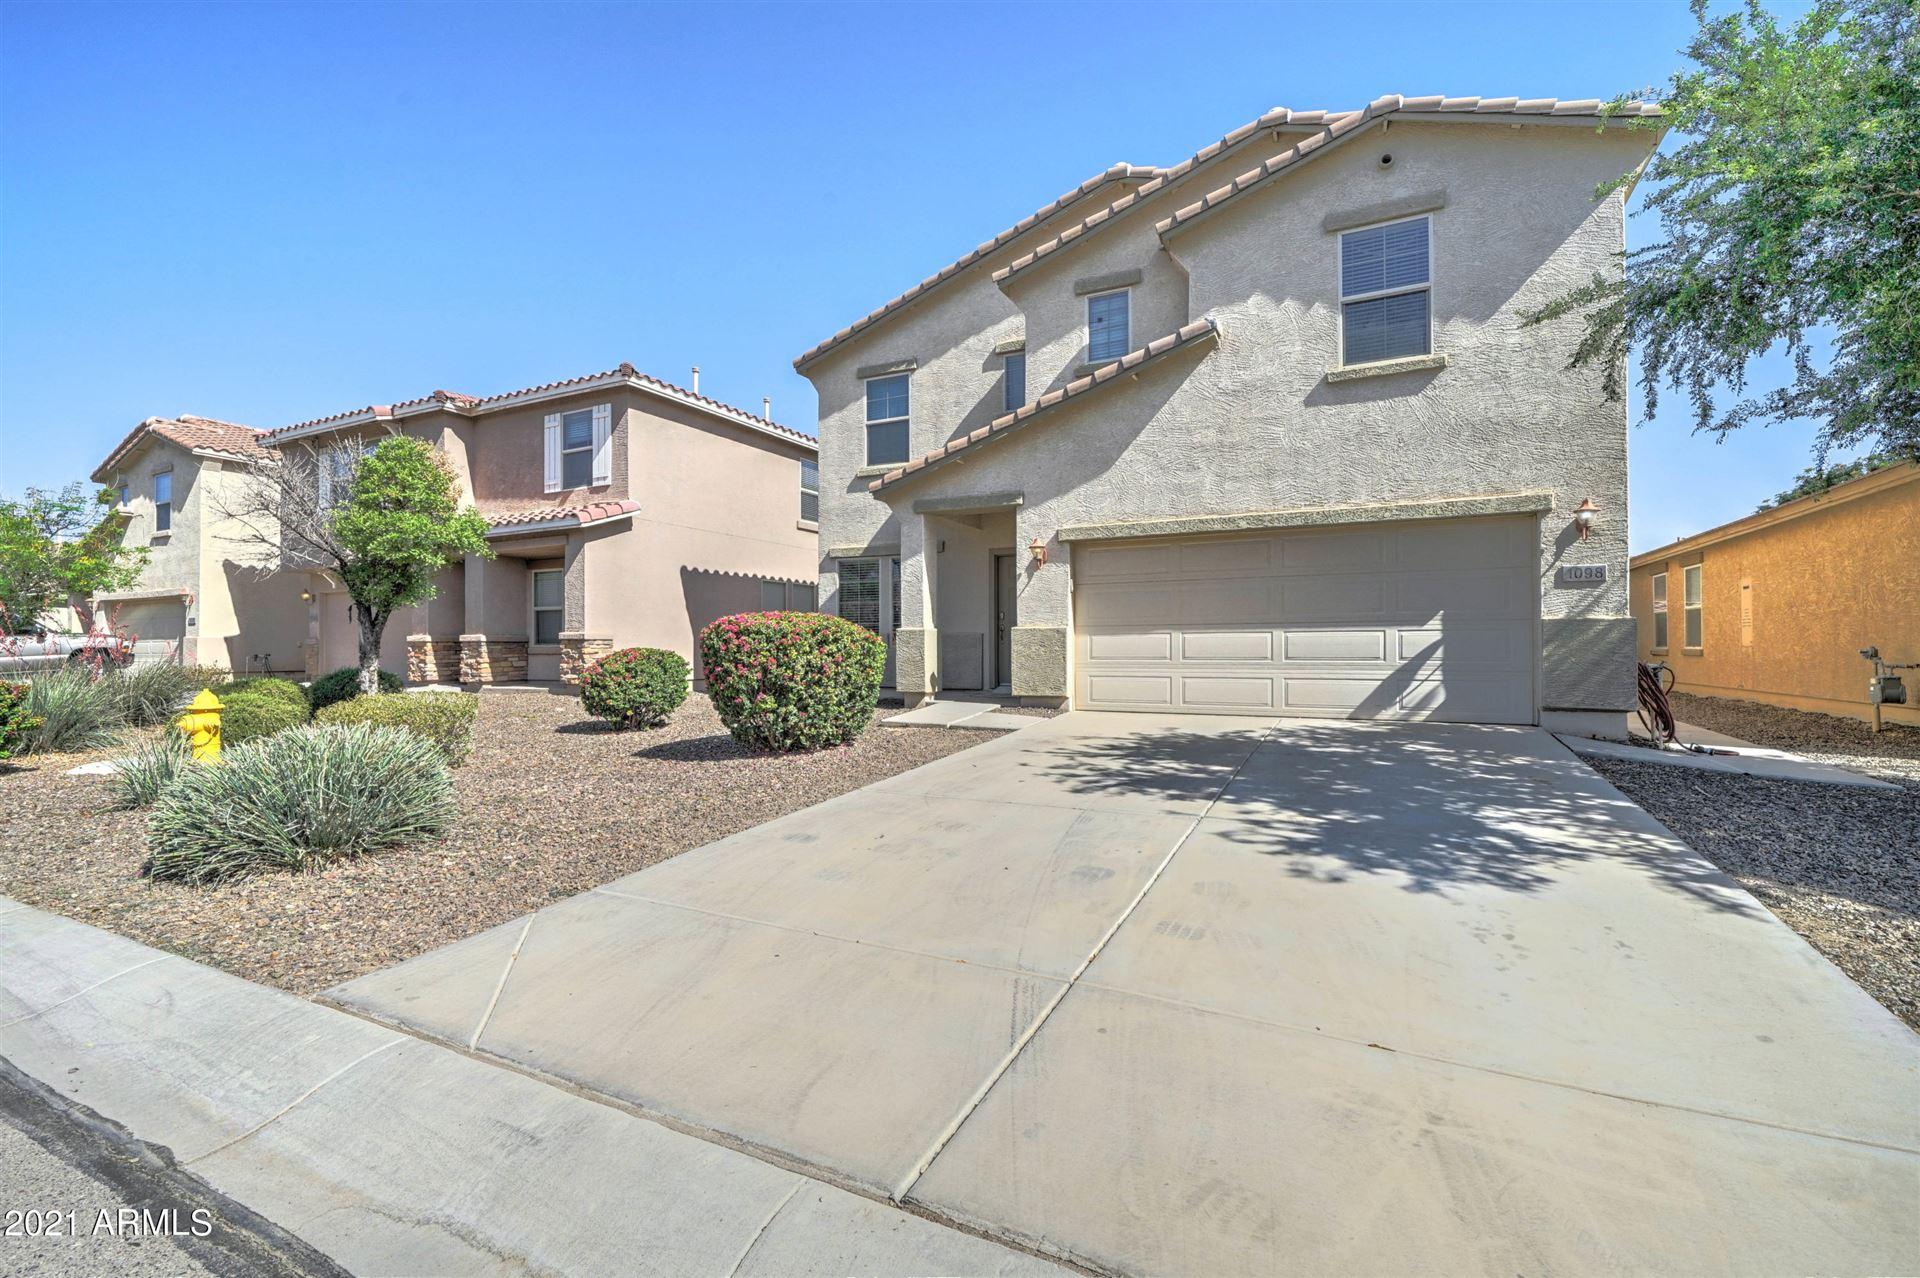 Photo of 1098 E KELSI Avenue, San Tan Valley, AZ 85140 (MLS # 6231721)